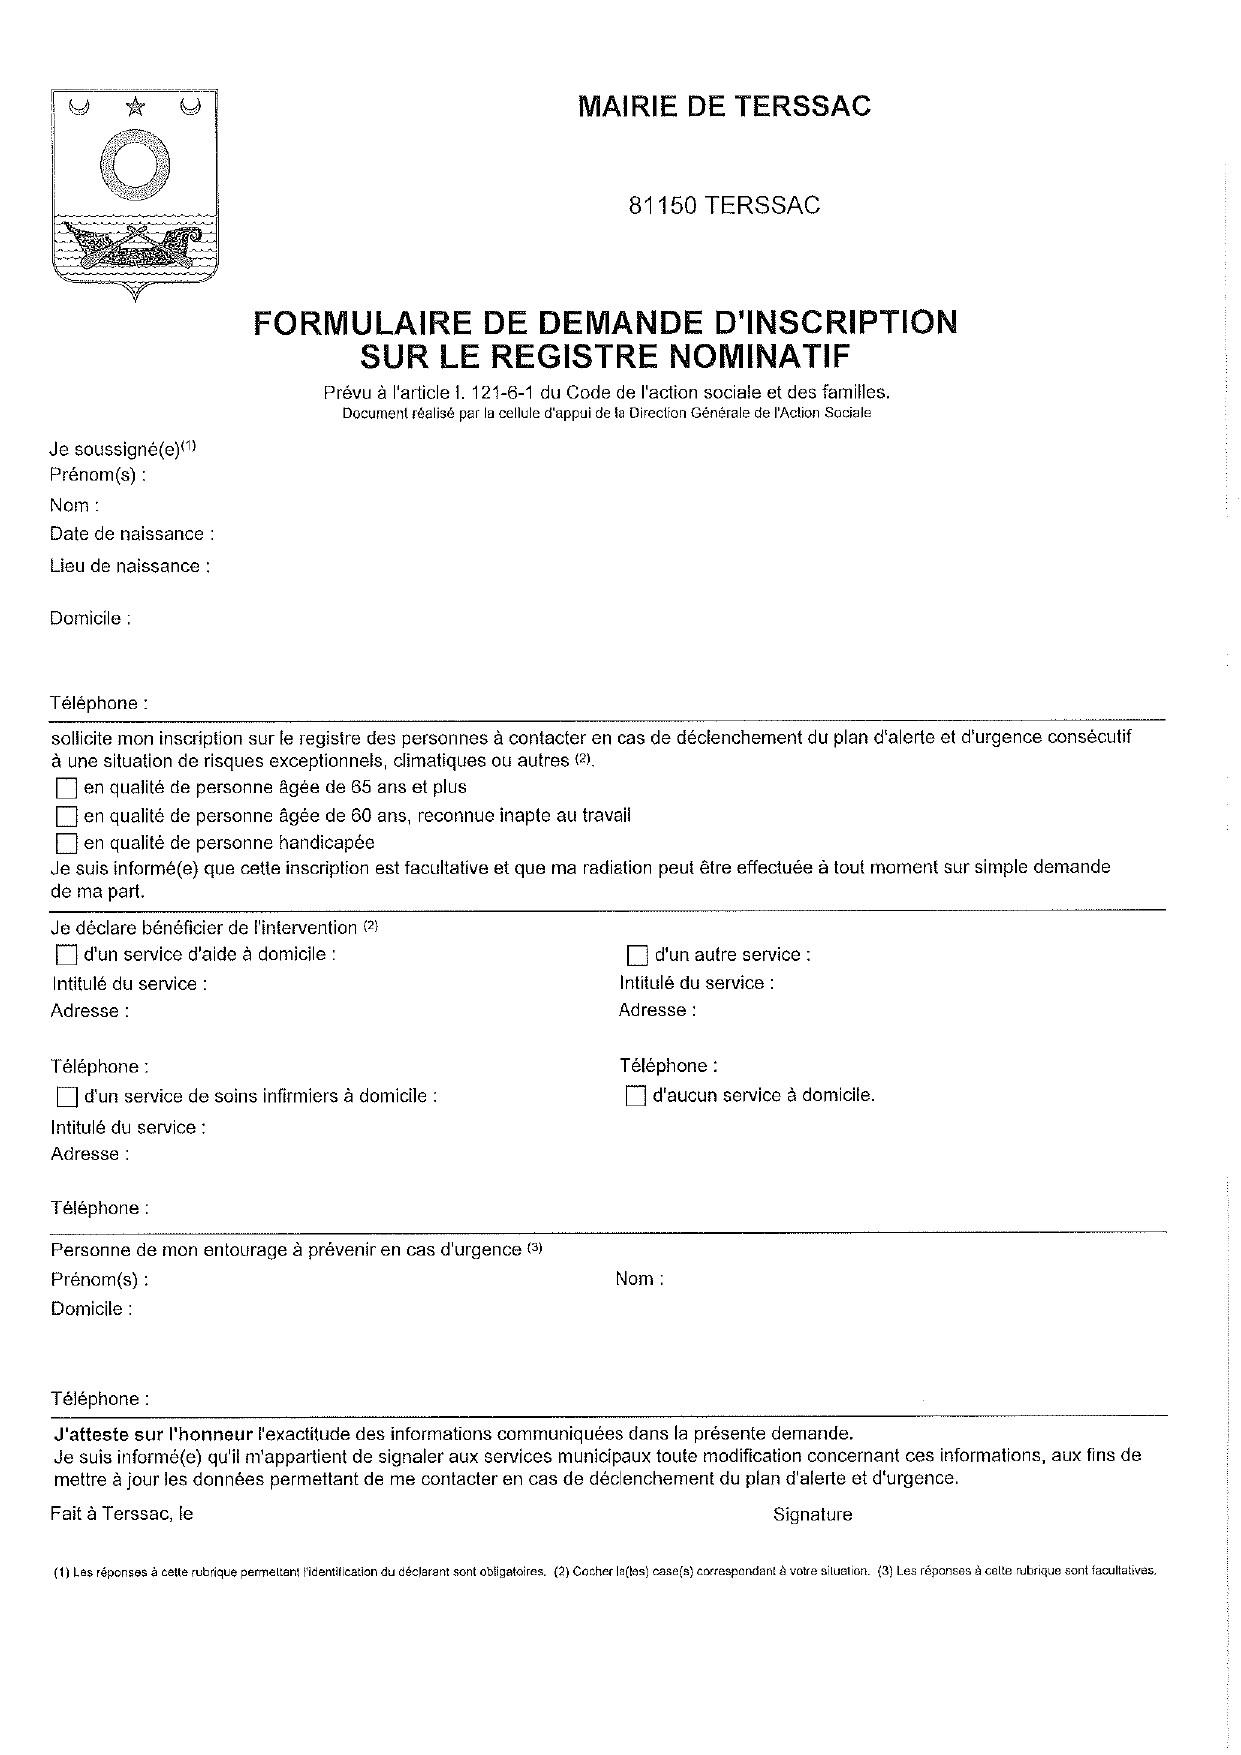 https://www.terssac.fr/sites/terssac.fr/www.terssac.fr/files/compte-rendu/alerte-canicule_site-cover.jpg